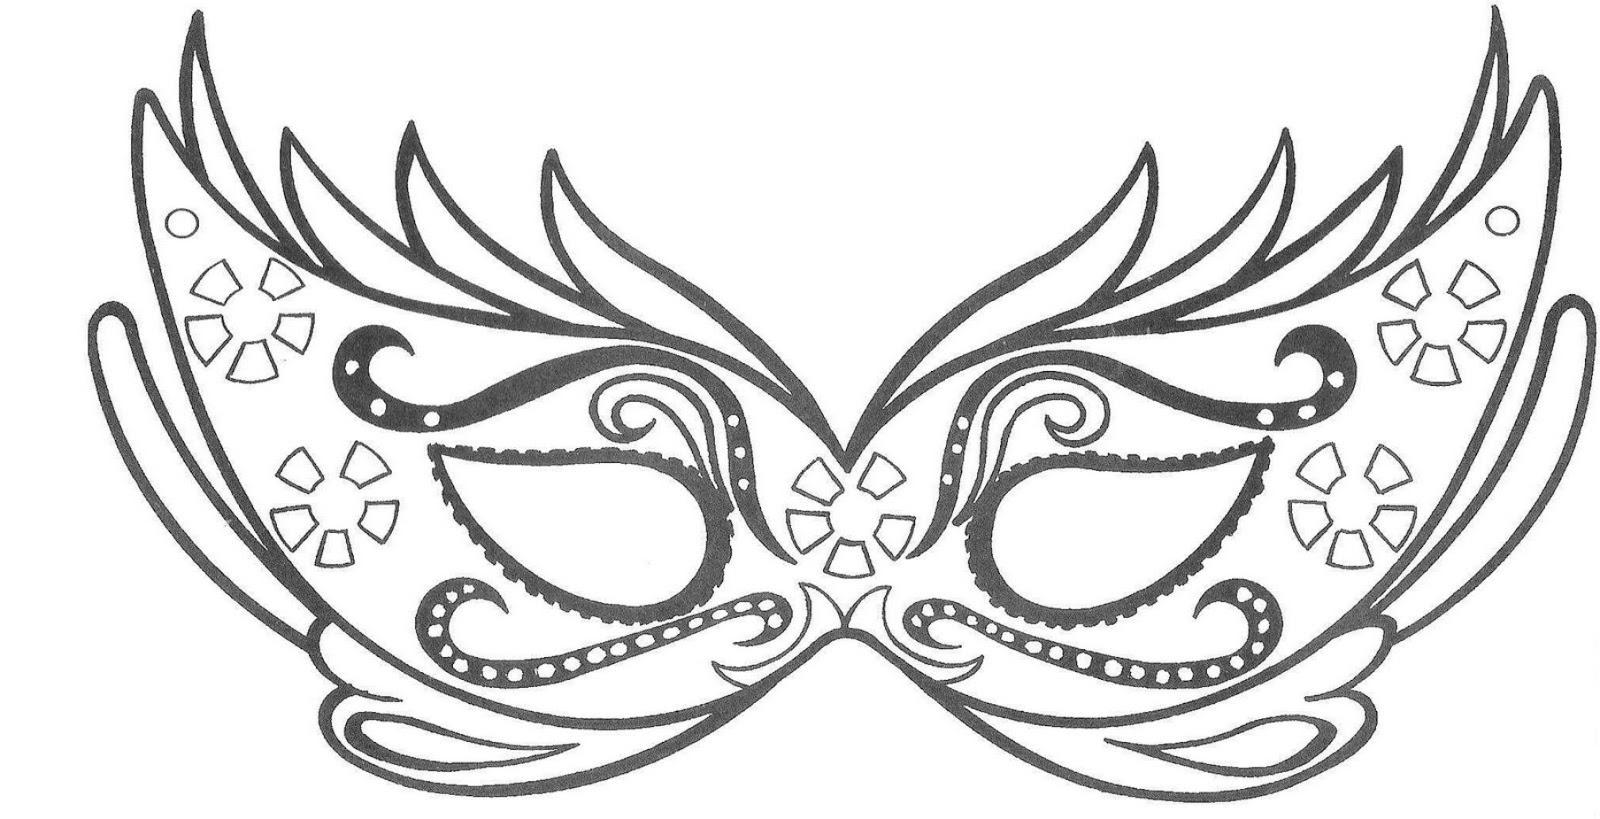 Disegni Da Colorare Maschere Di Carnevale